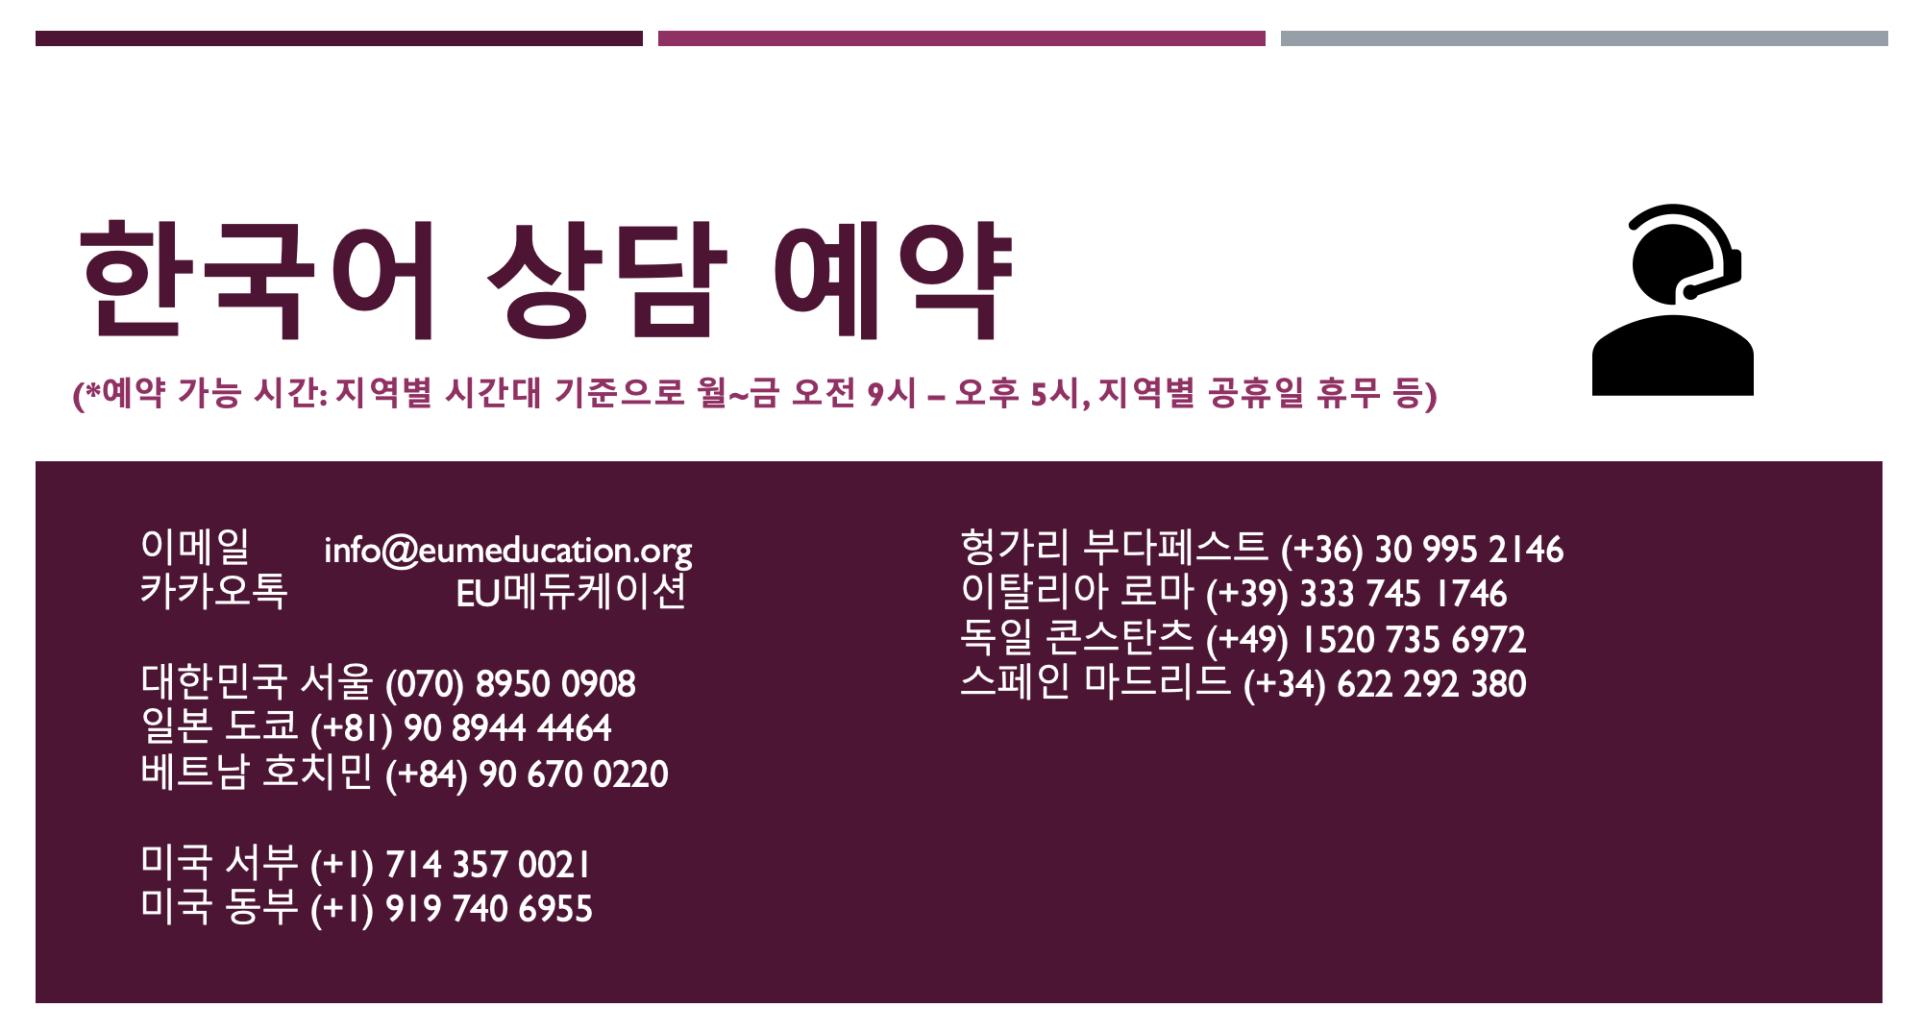 contact-info_KOR